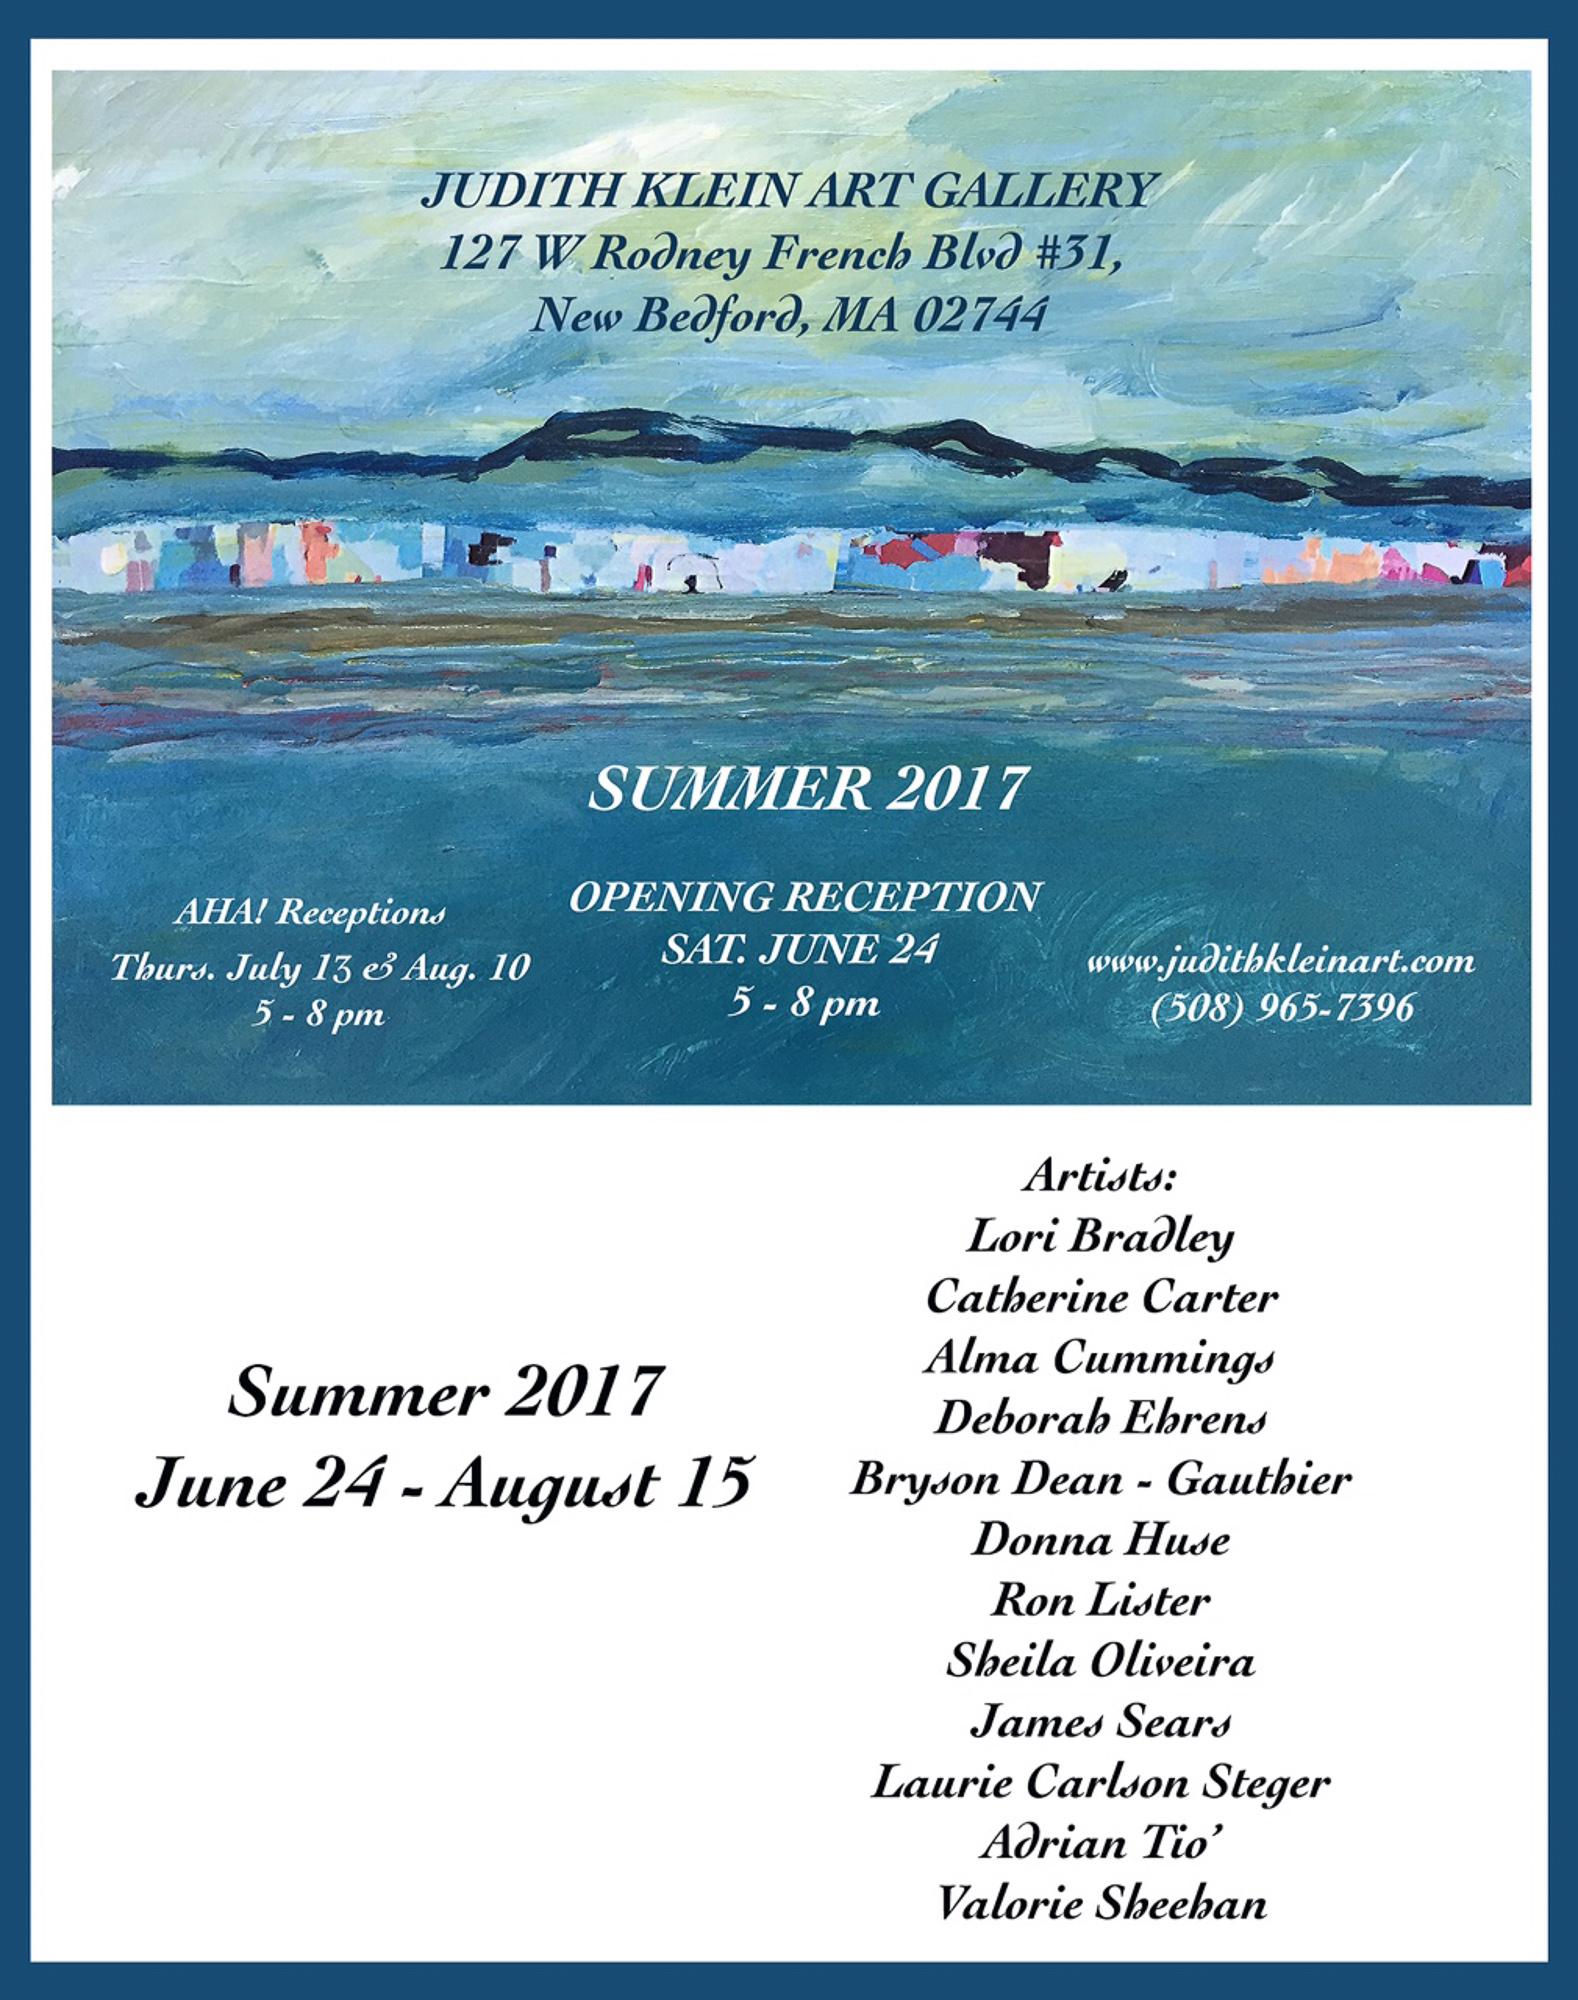 JK_Summer_2017